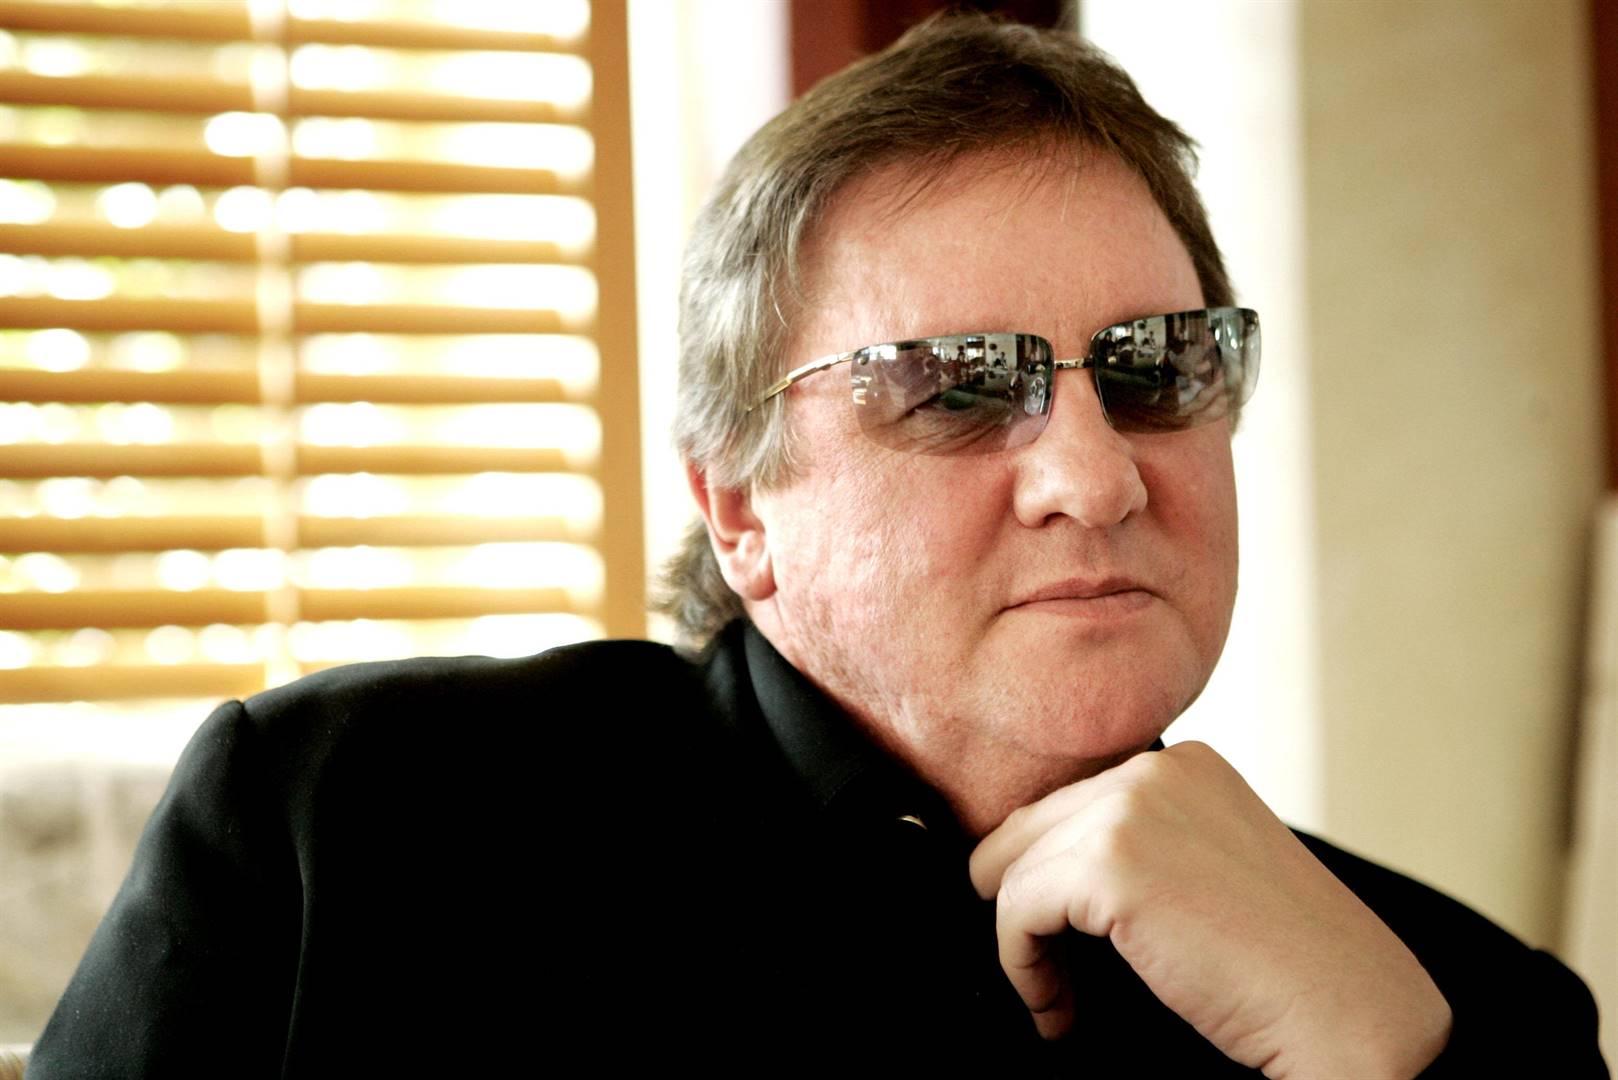 Douw Steyn won the lawsuit against his ex-girlfriend, Donne Botha. Photo: Archive